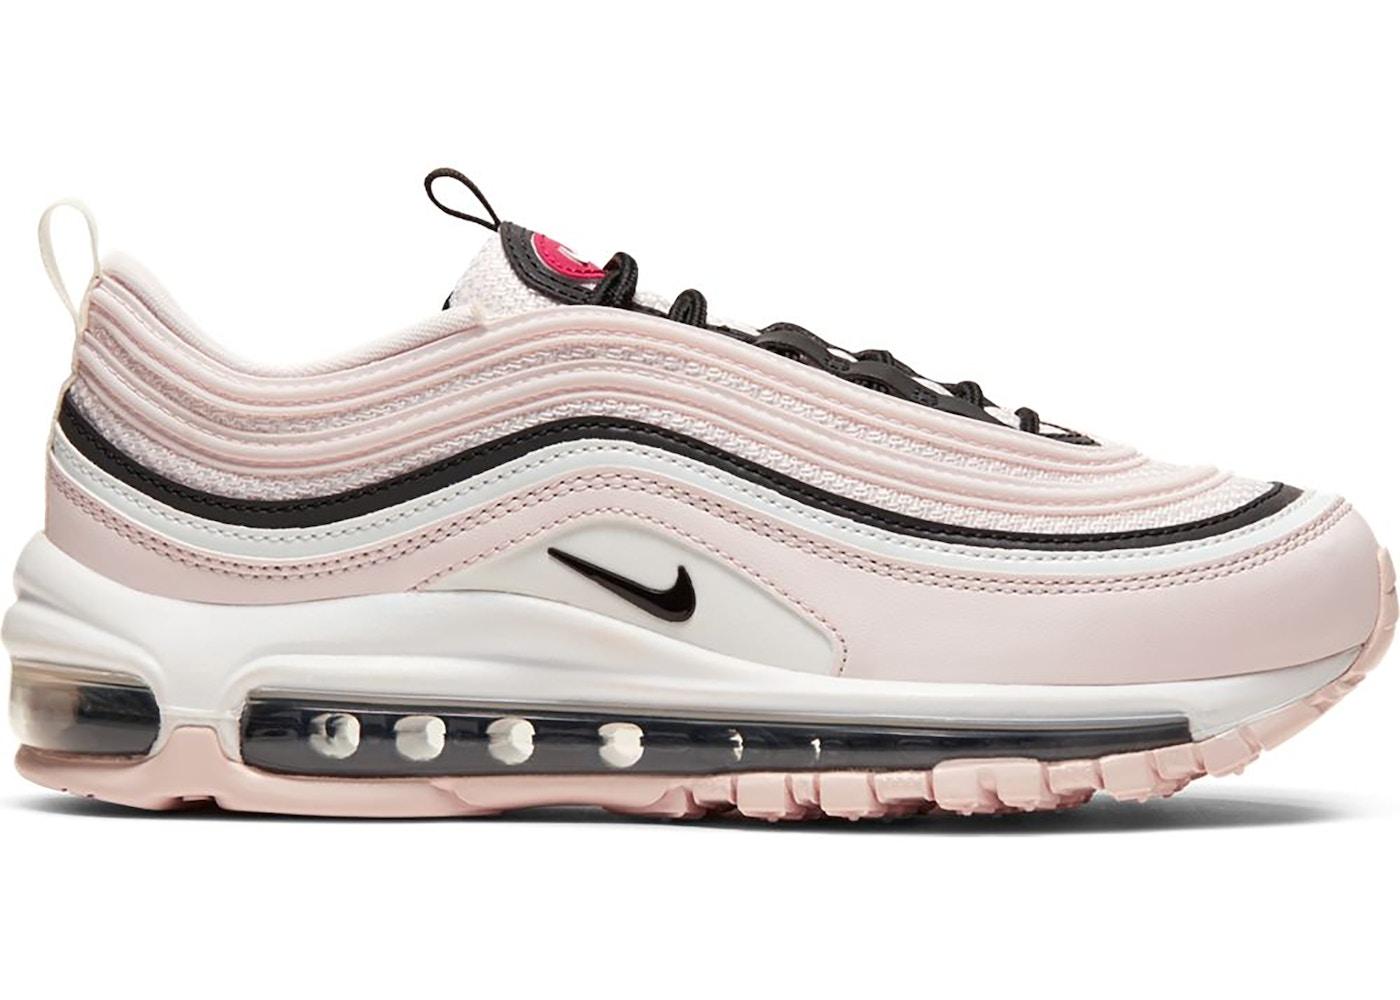 Nike Air Max 97 Light Soft Pink Black (W)